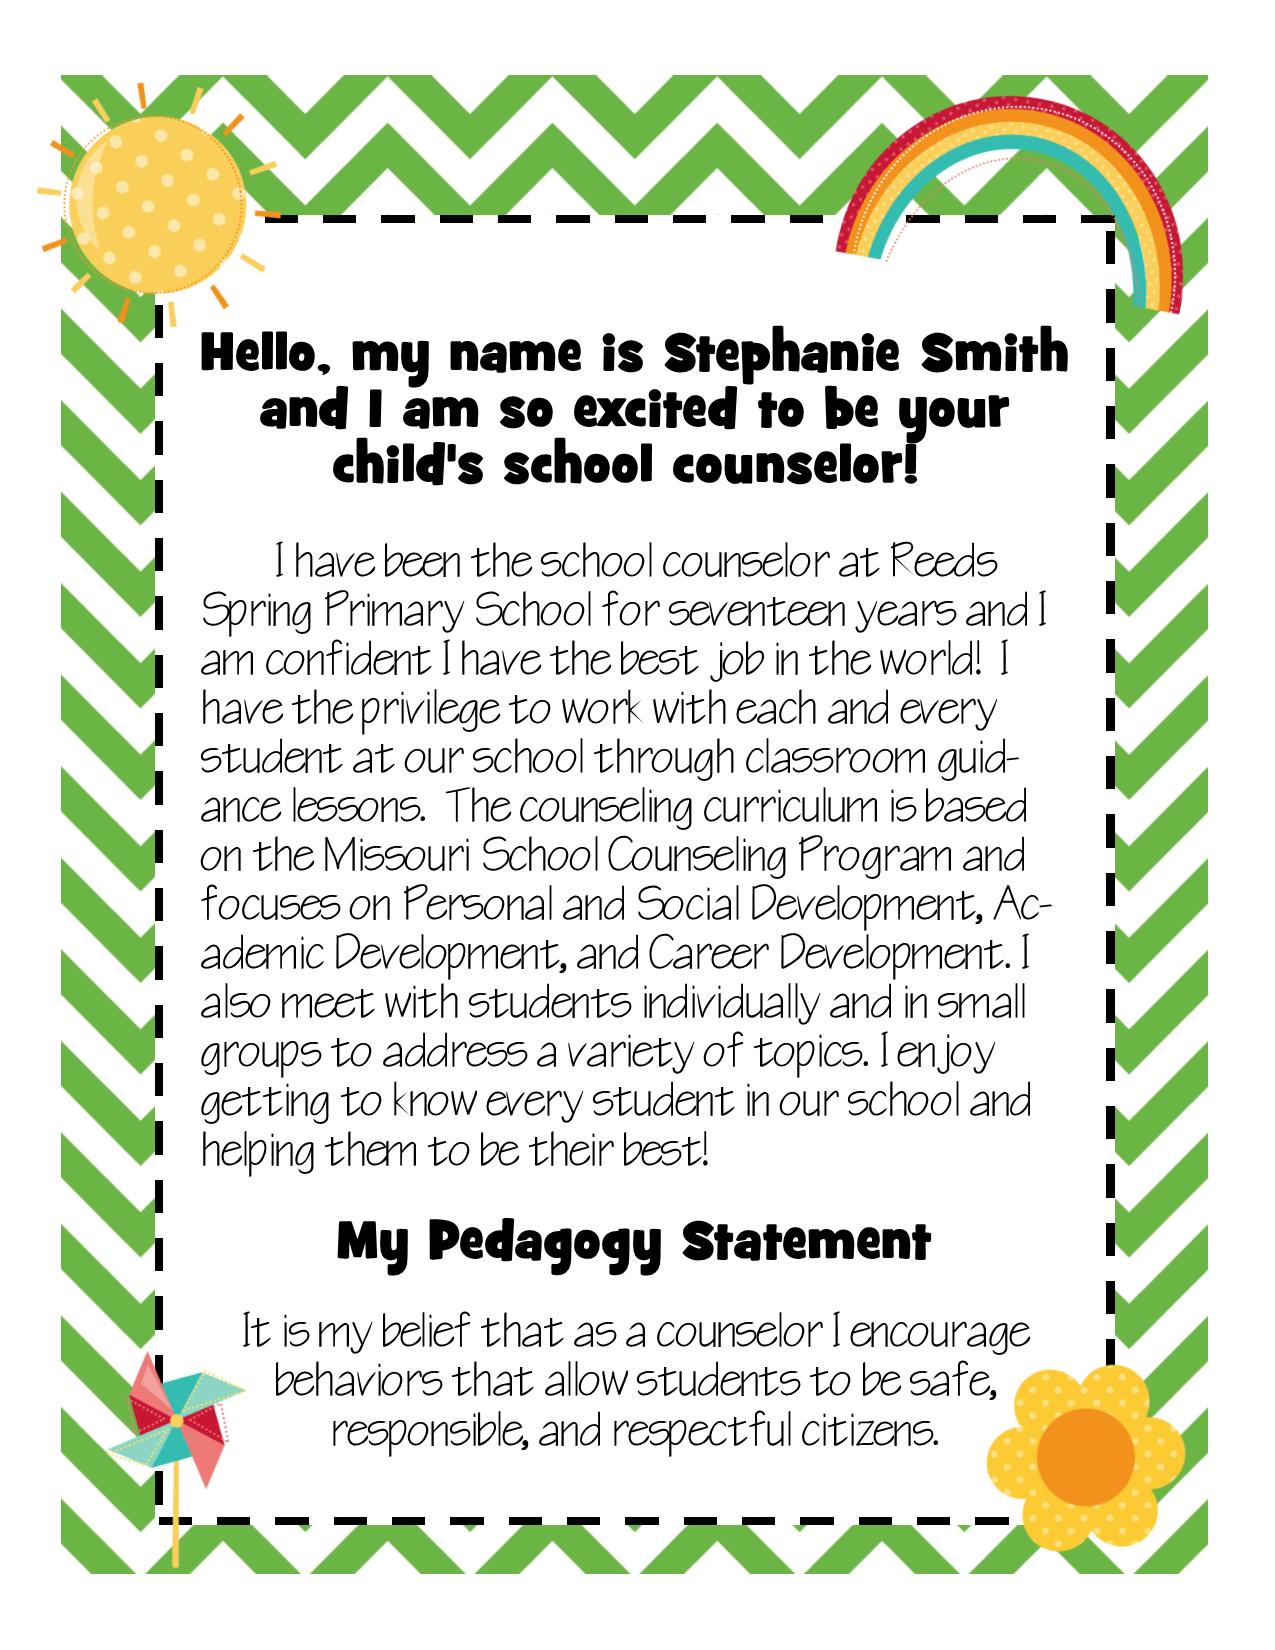 Stephanie Smith Introduction